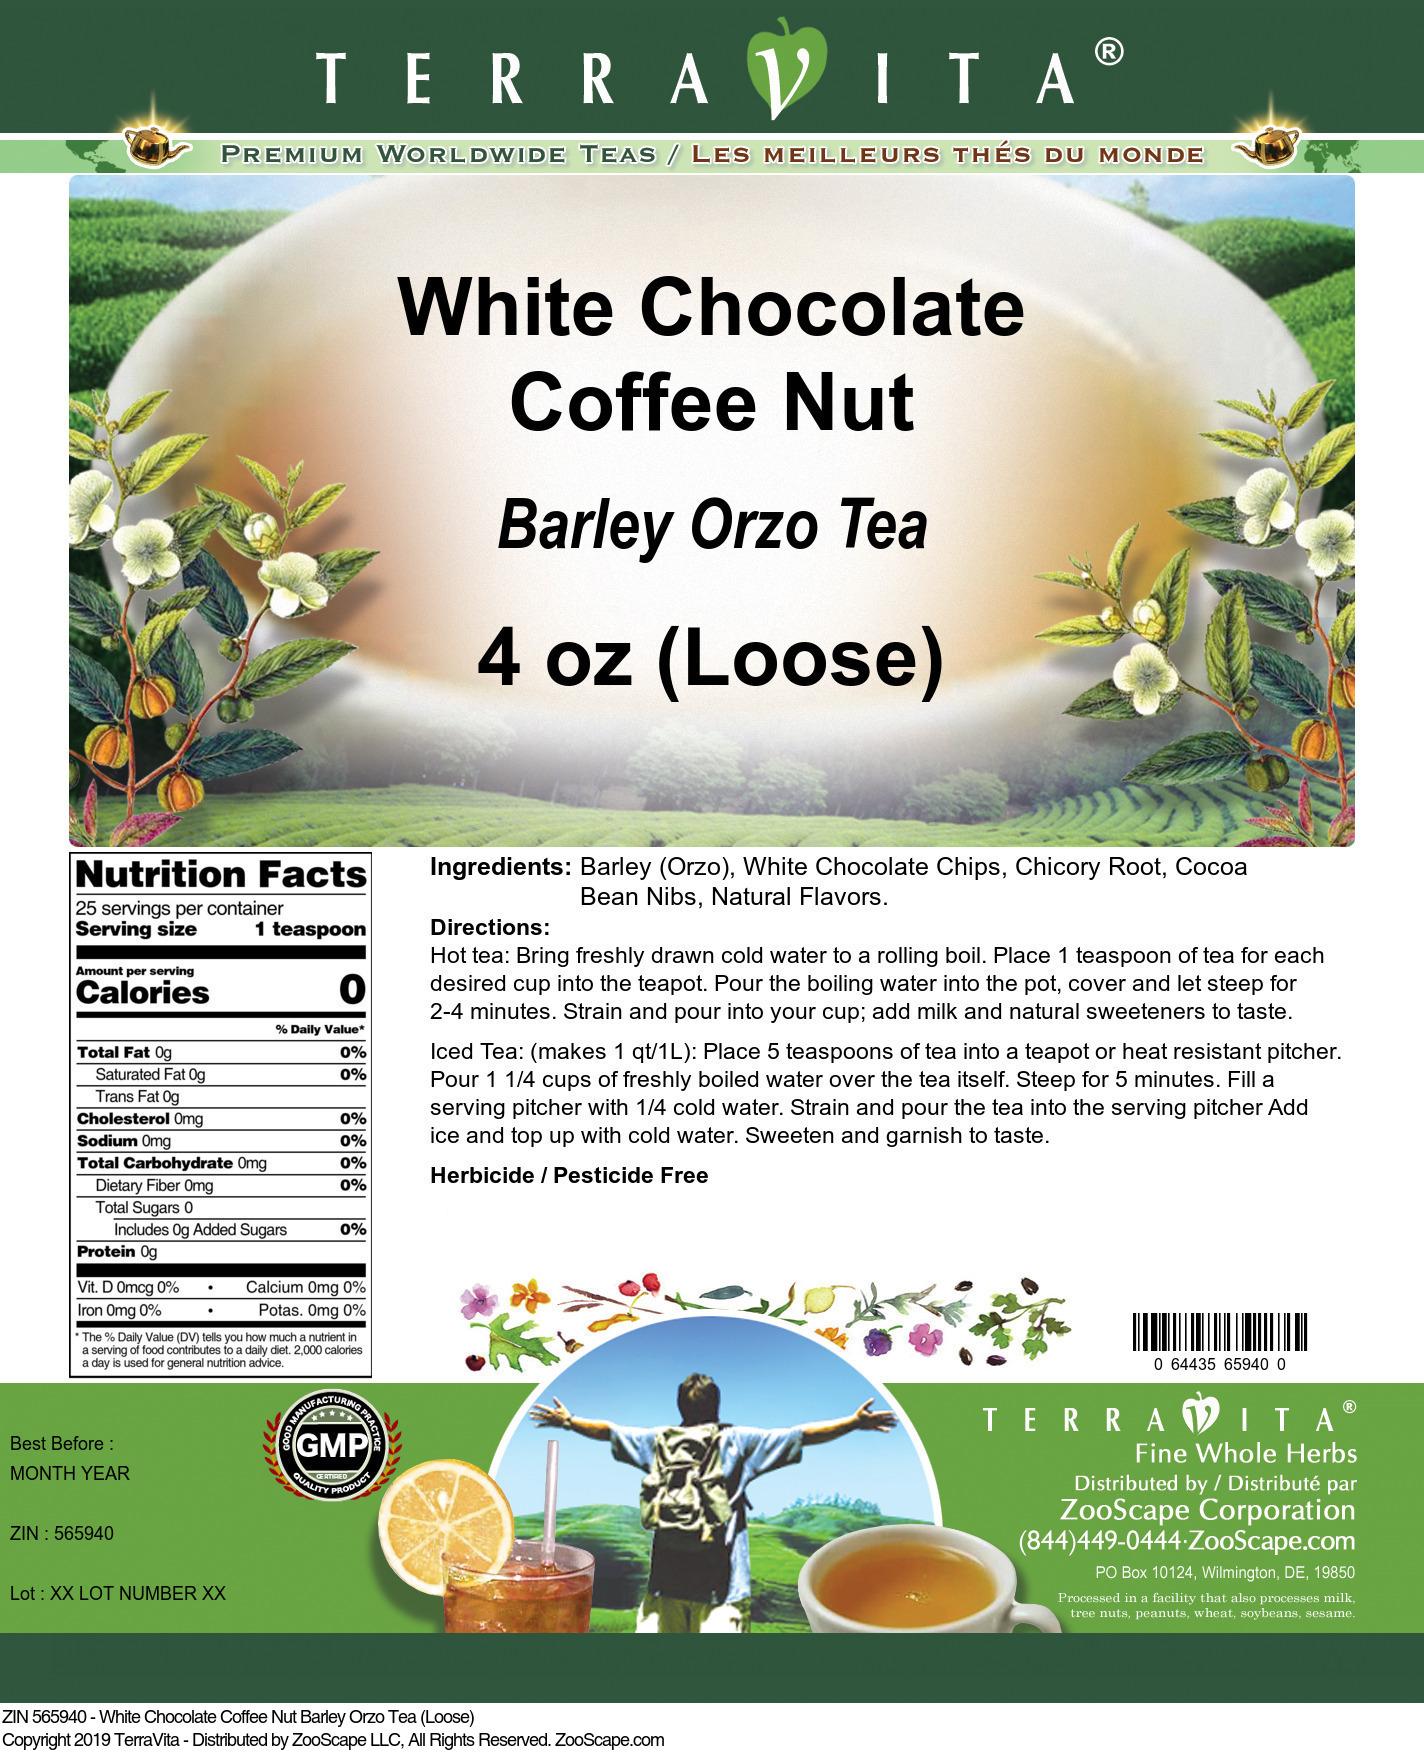 White Chocolate Coffee Nut Barley Orzo